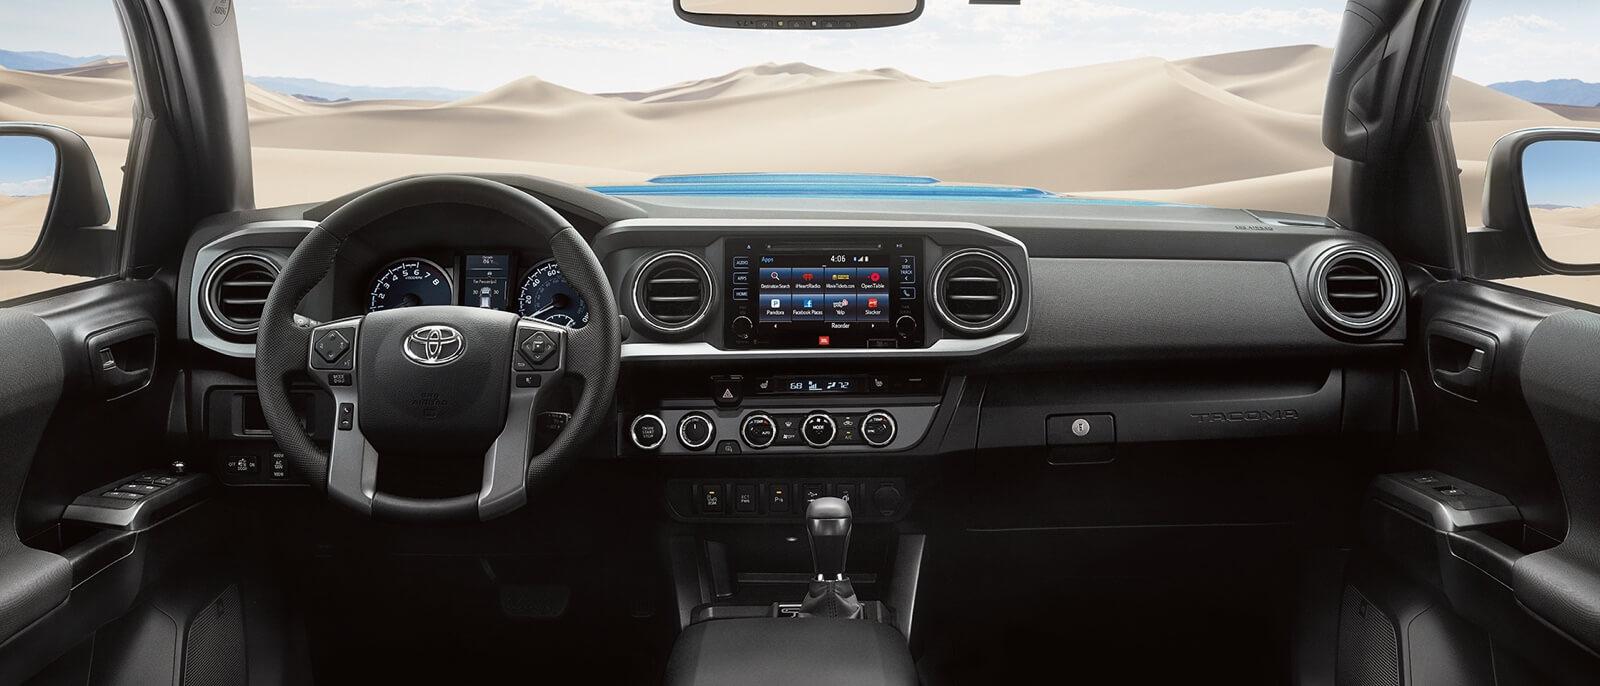 2017 Toyota Tacoma front interior